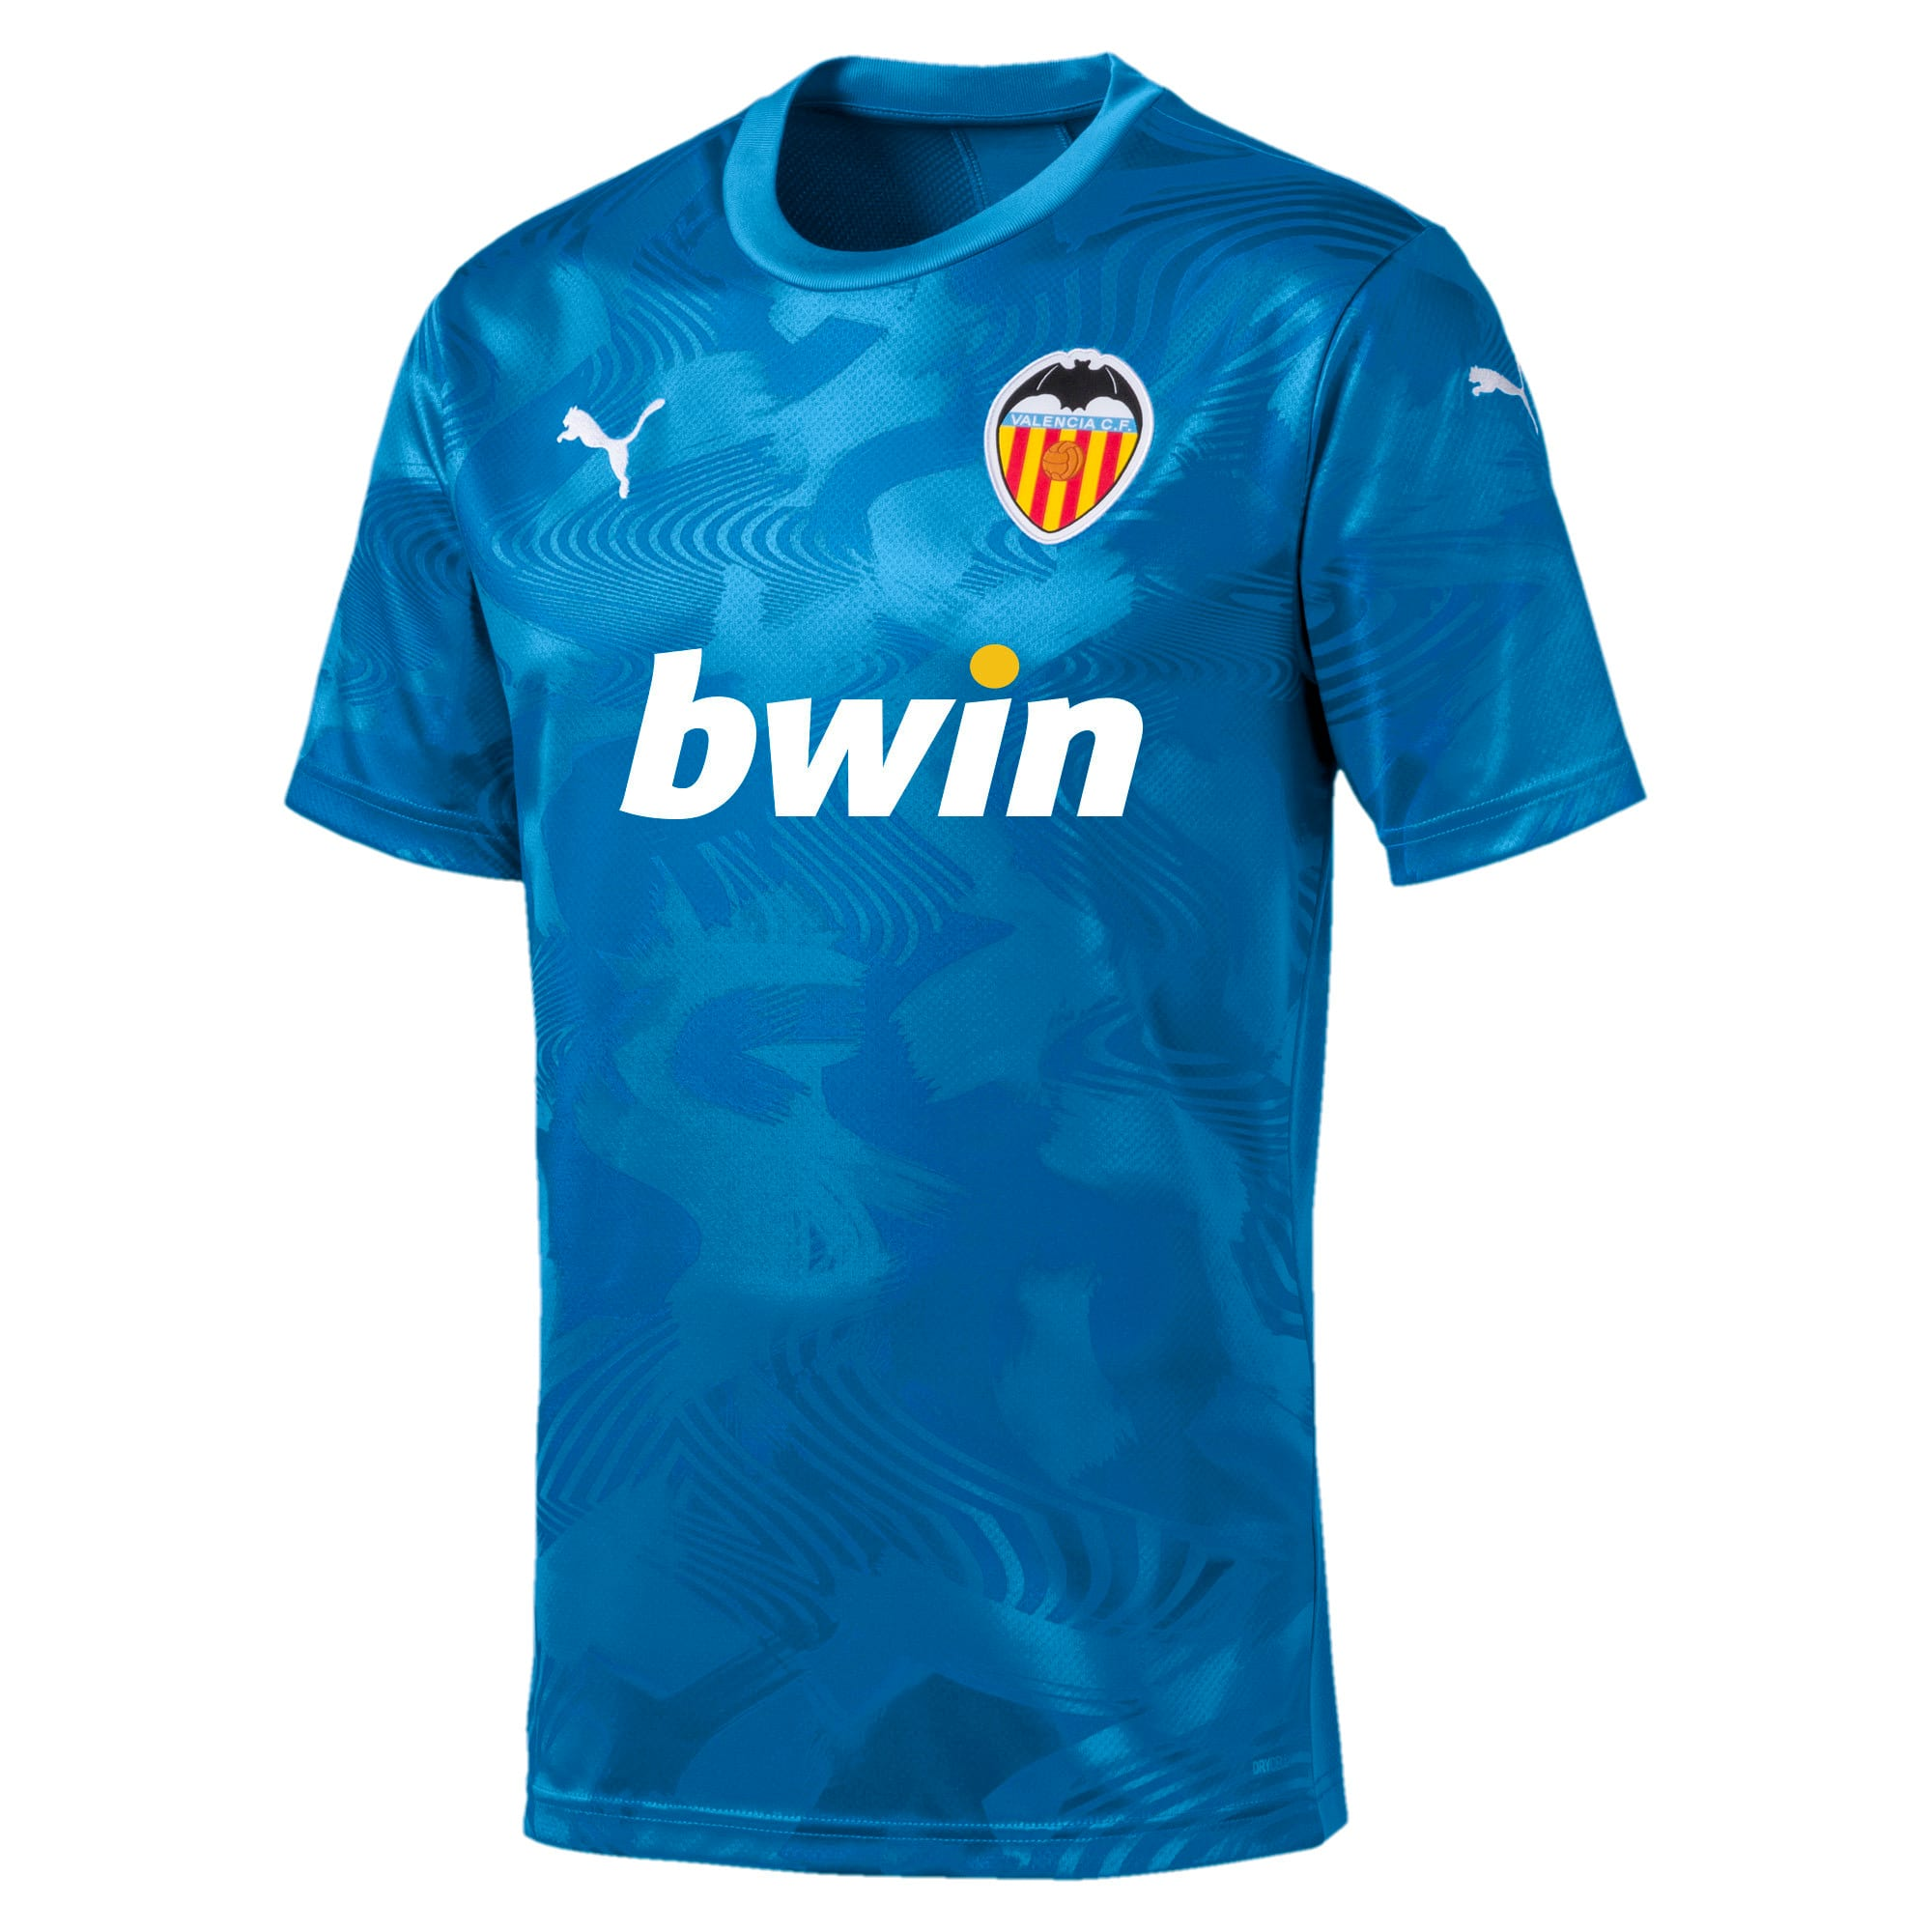 Thumbnail 1 of Valencia CF Third Replica Men's Shirt, Bleu Azur-Indigo Bunting, medium